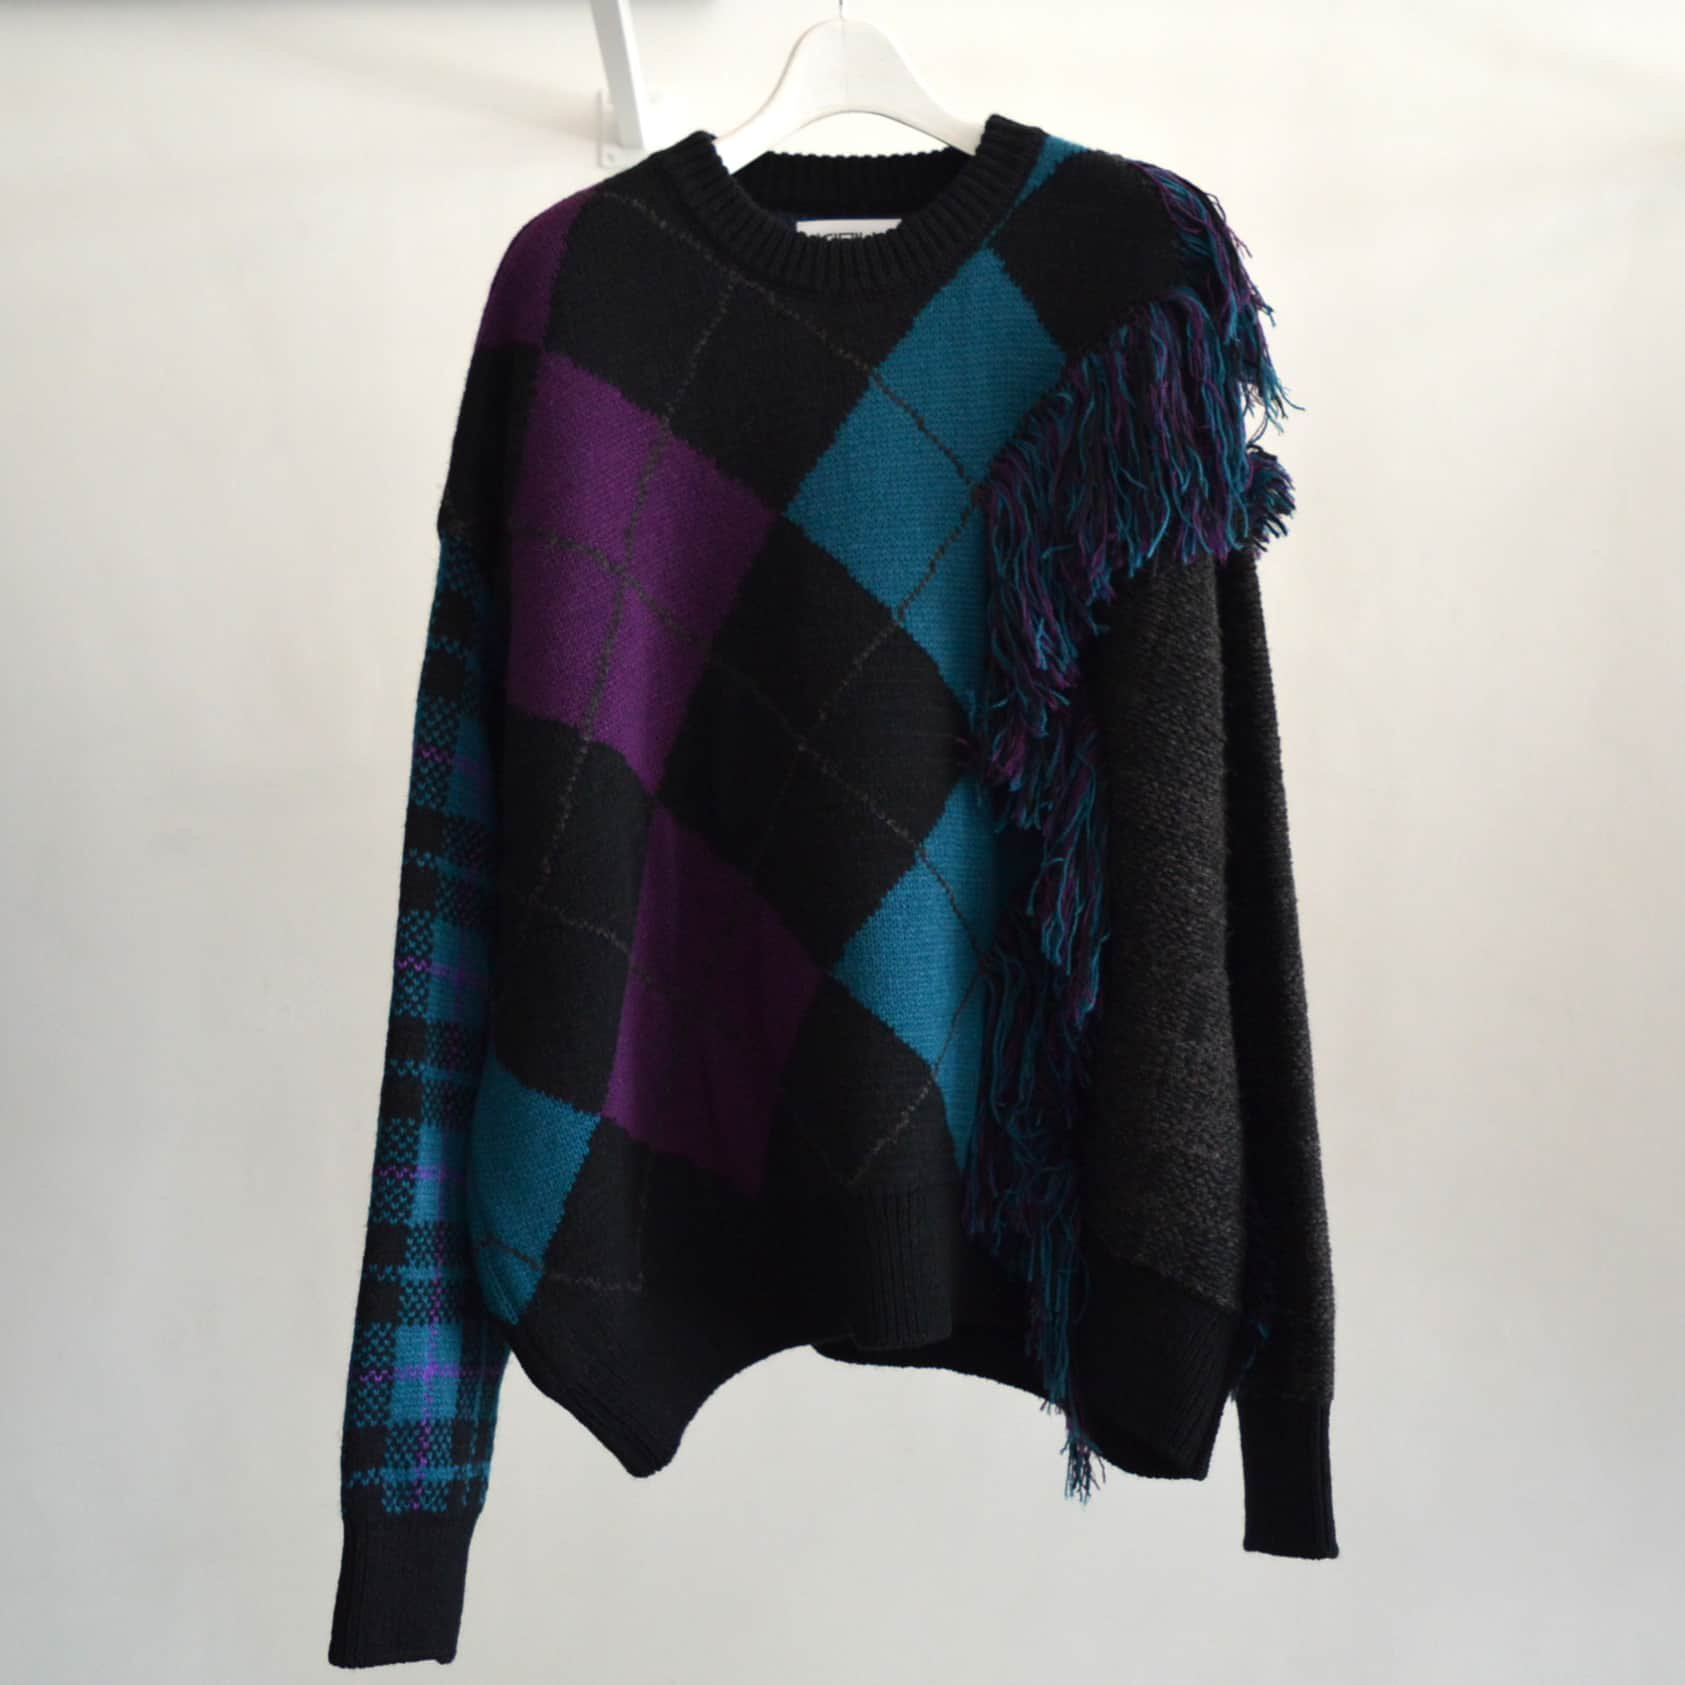 【KIDILL×rurumu:】Destroy Argyle Tartan Pullover Knit